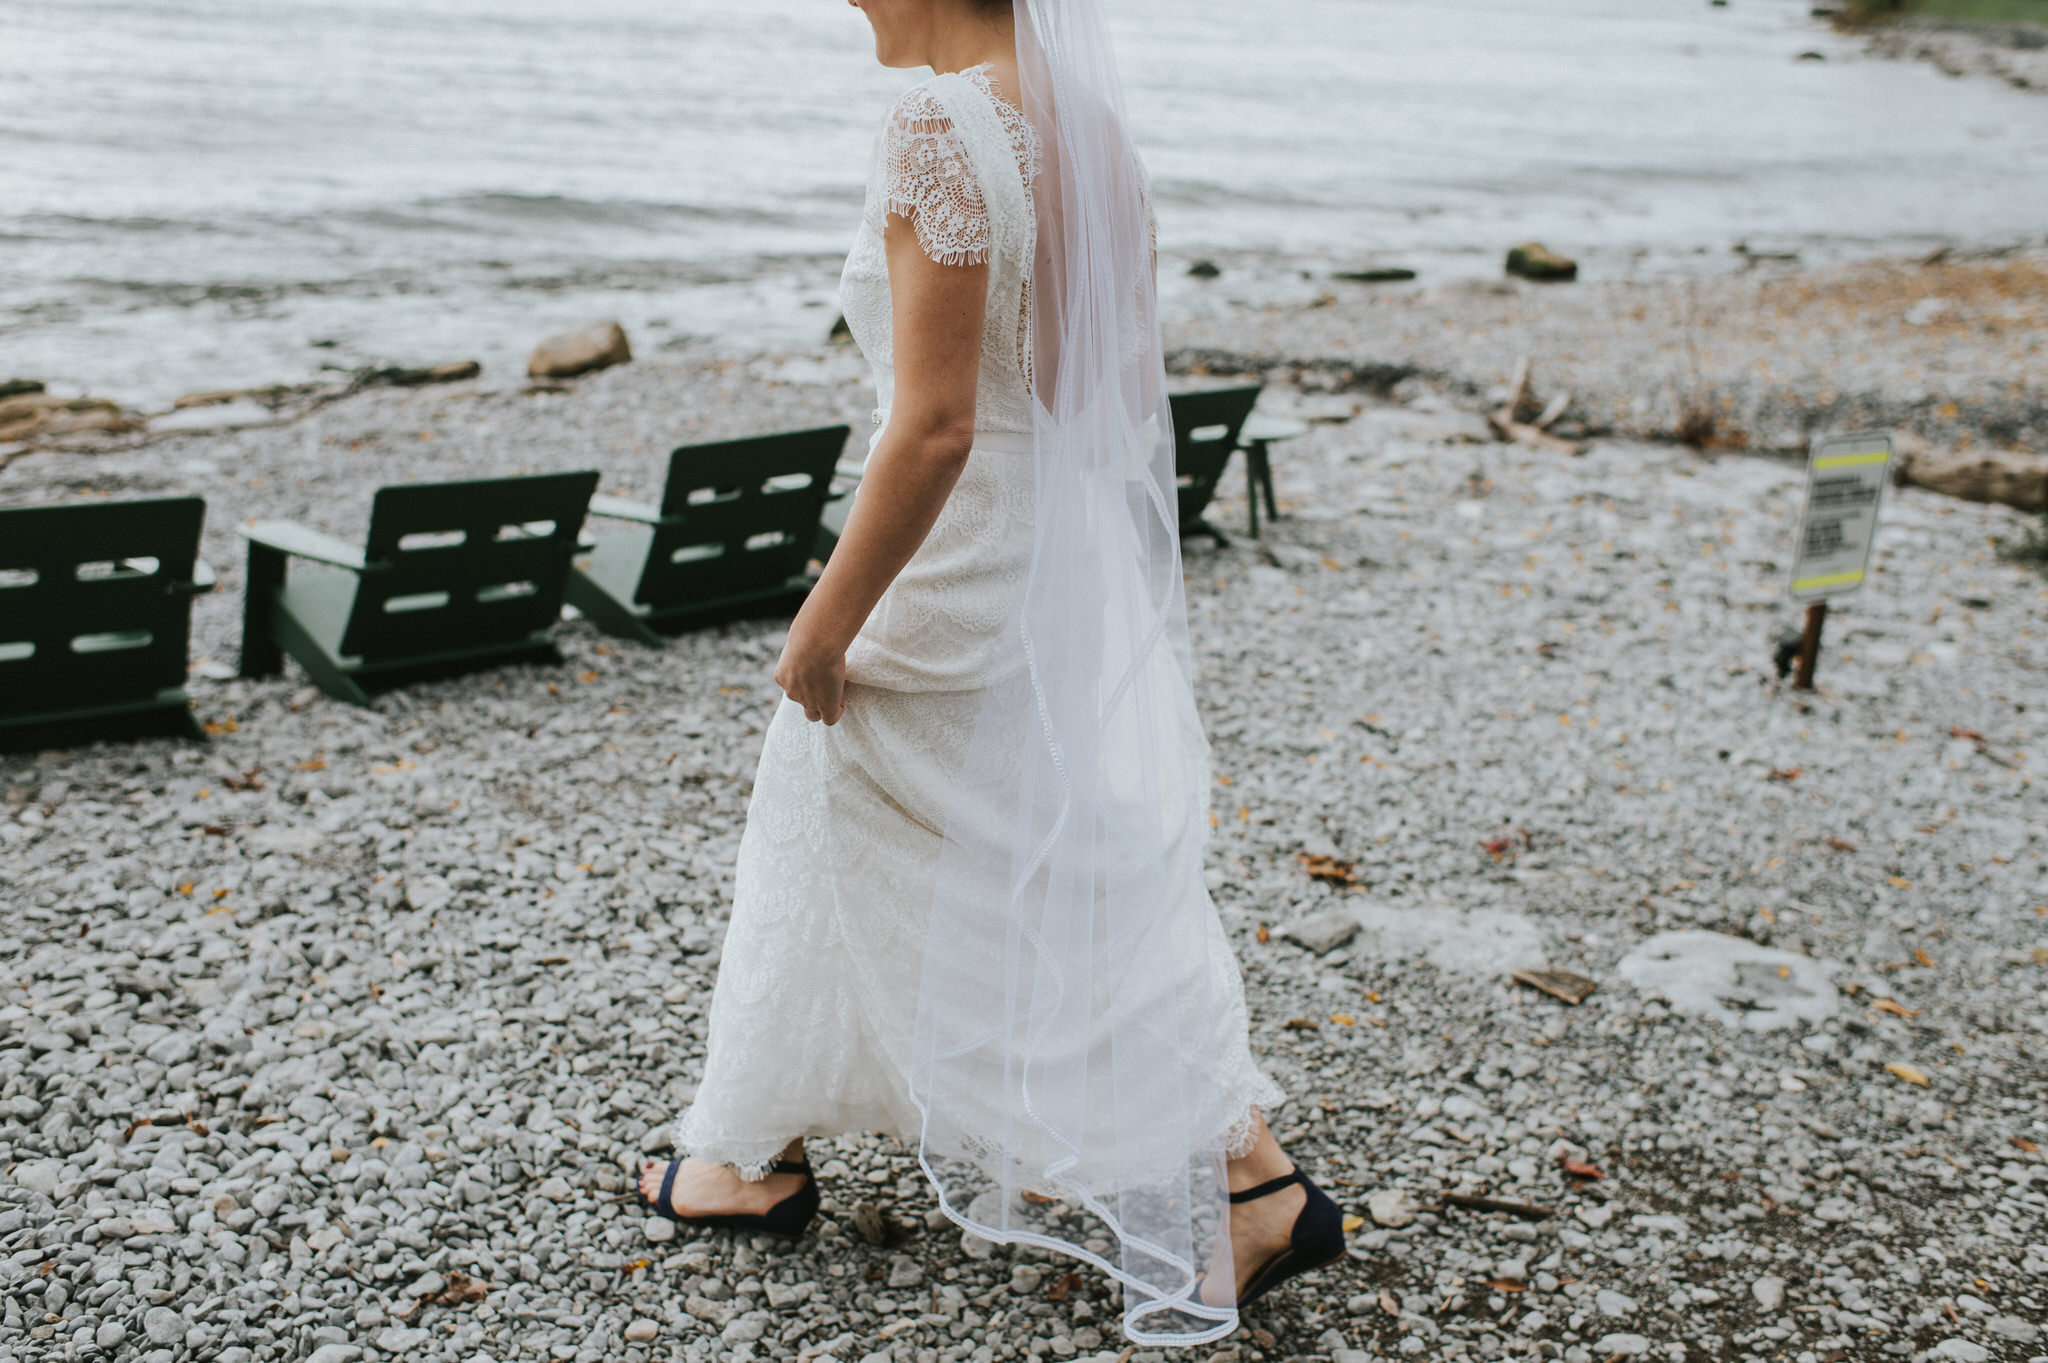 scarletoneillphotography_weddingphotography_prince edward county weddings033.JPG